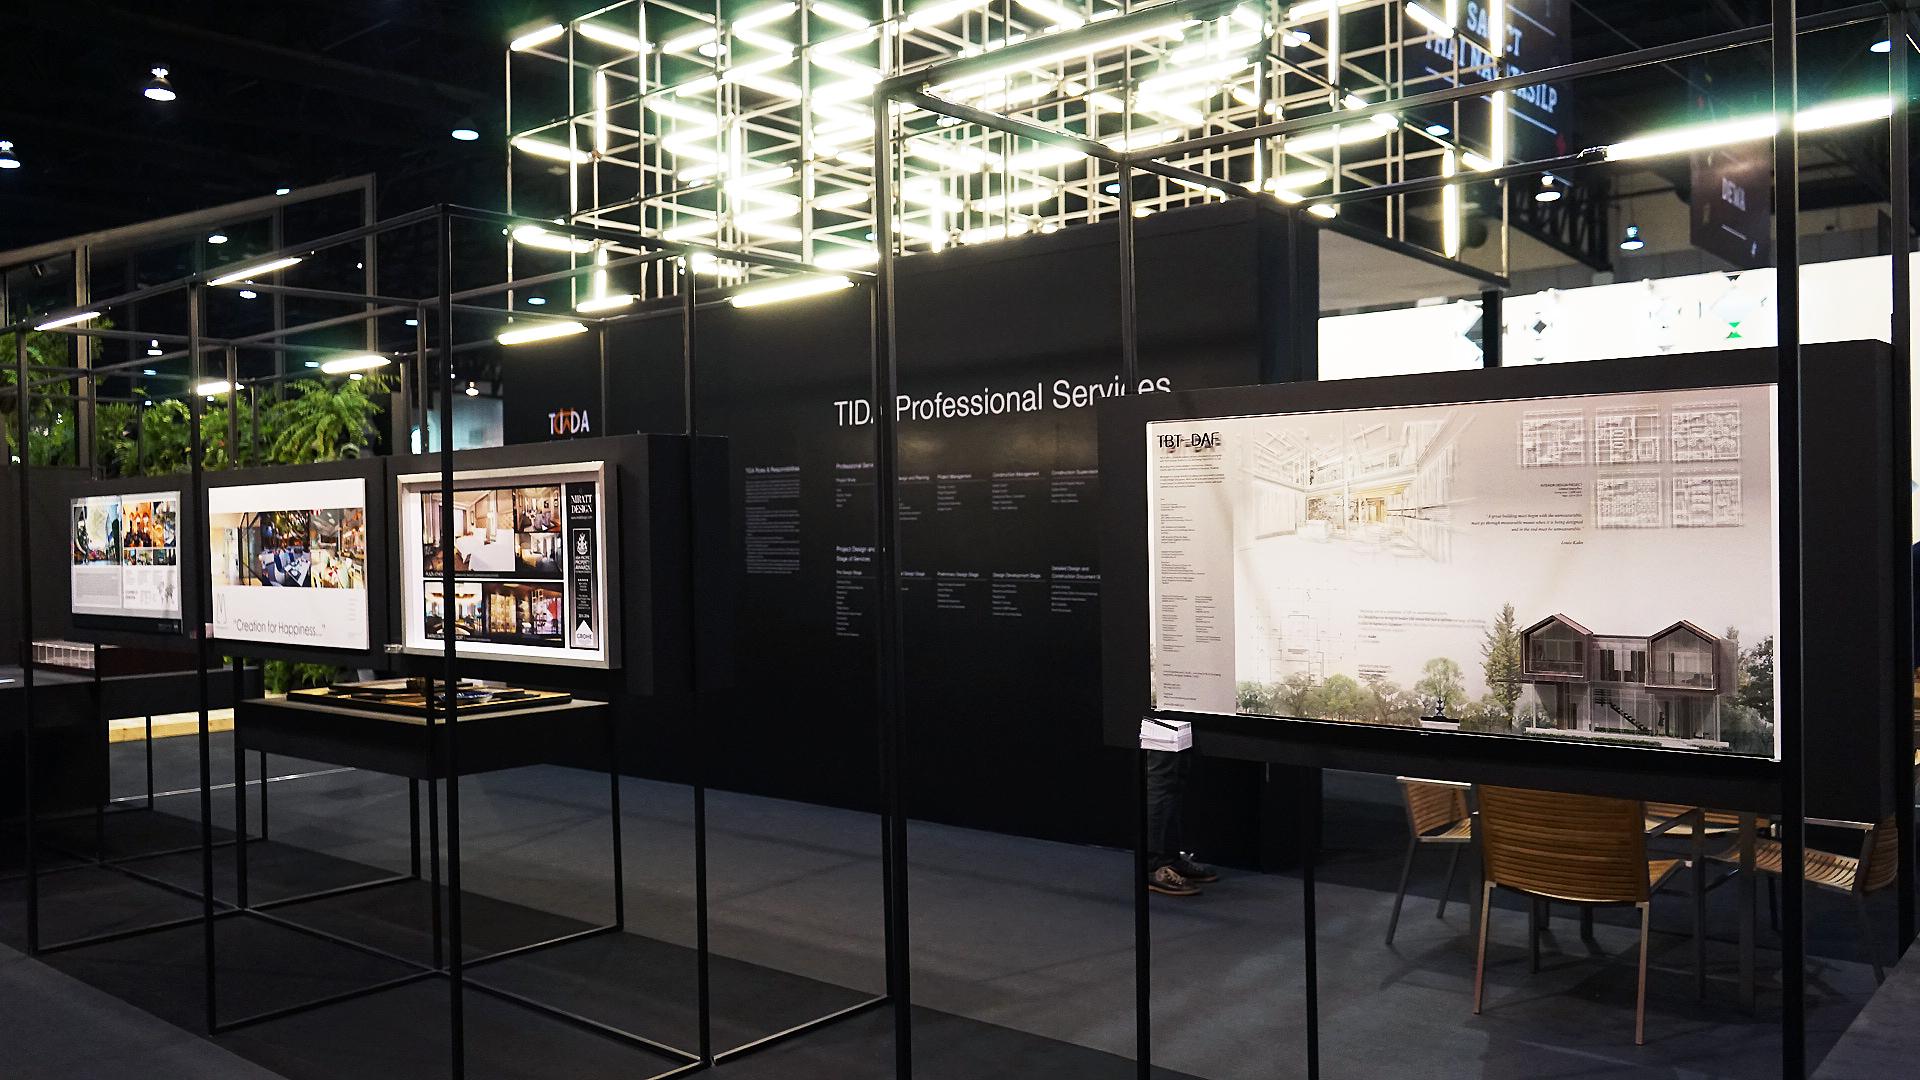 tbt-daf_tida 2015_exhibition 1